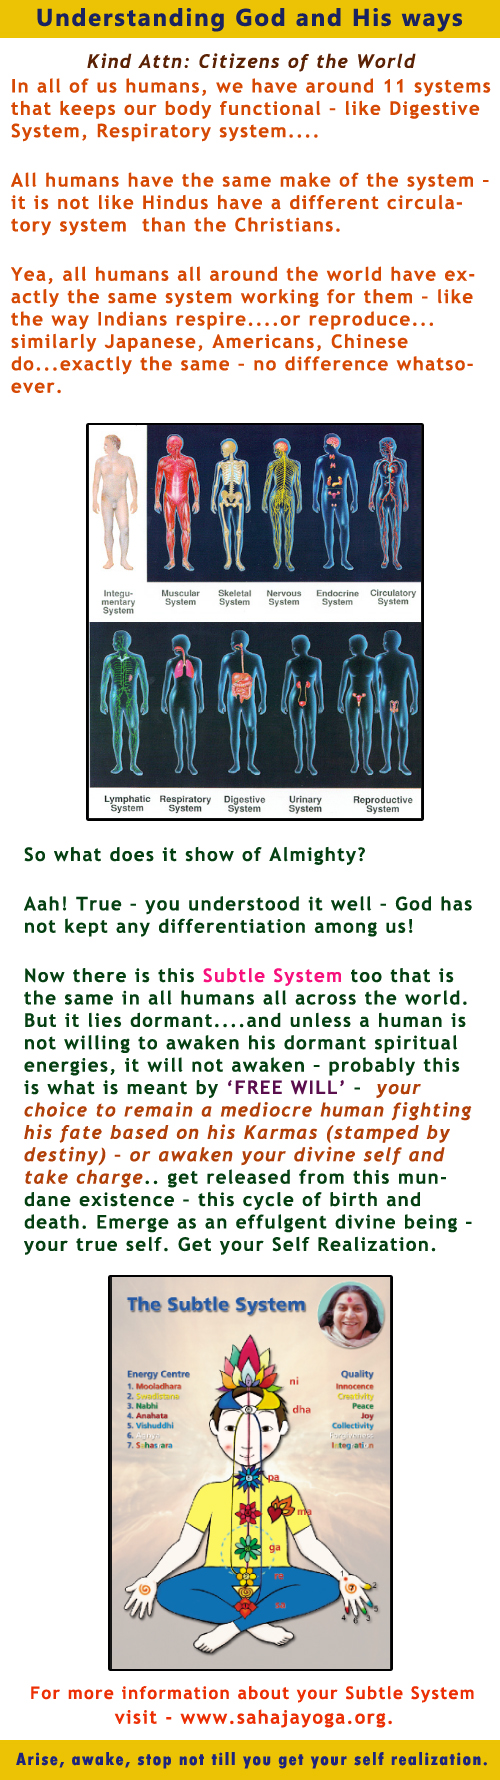 understanding-god-sahaja-yoga